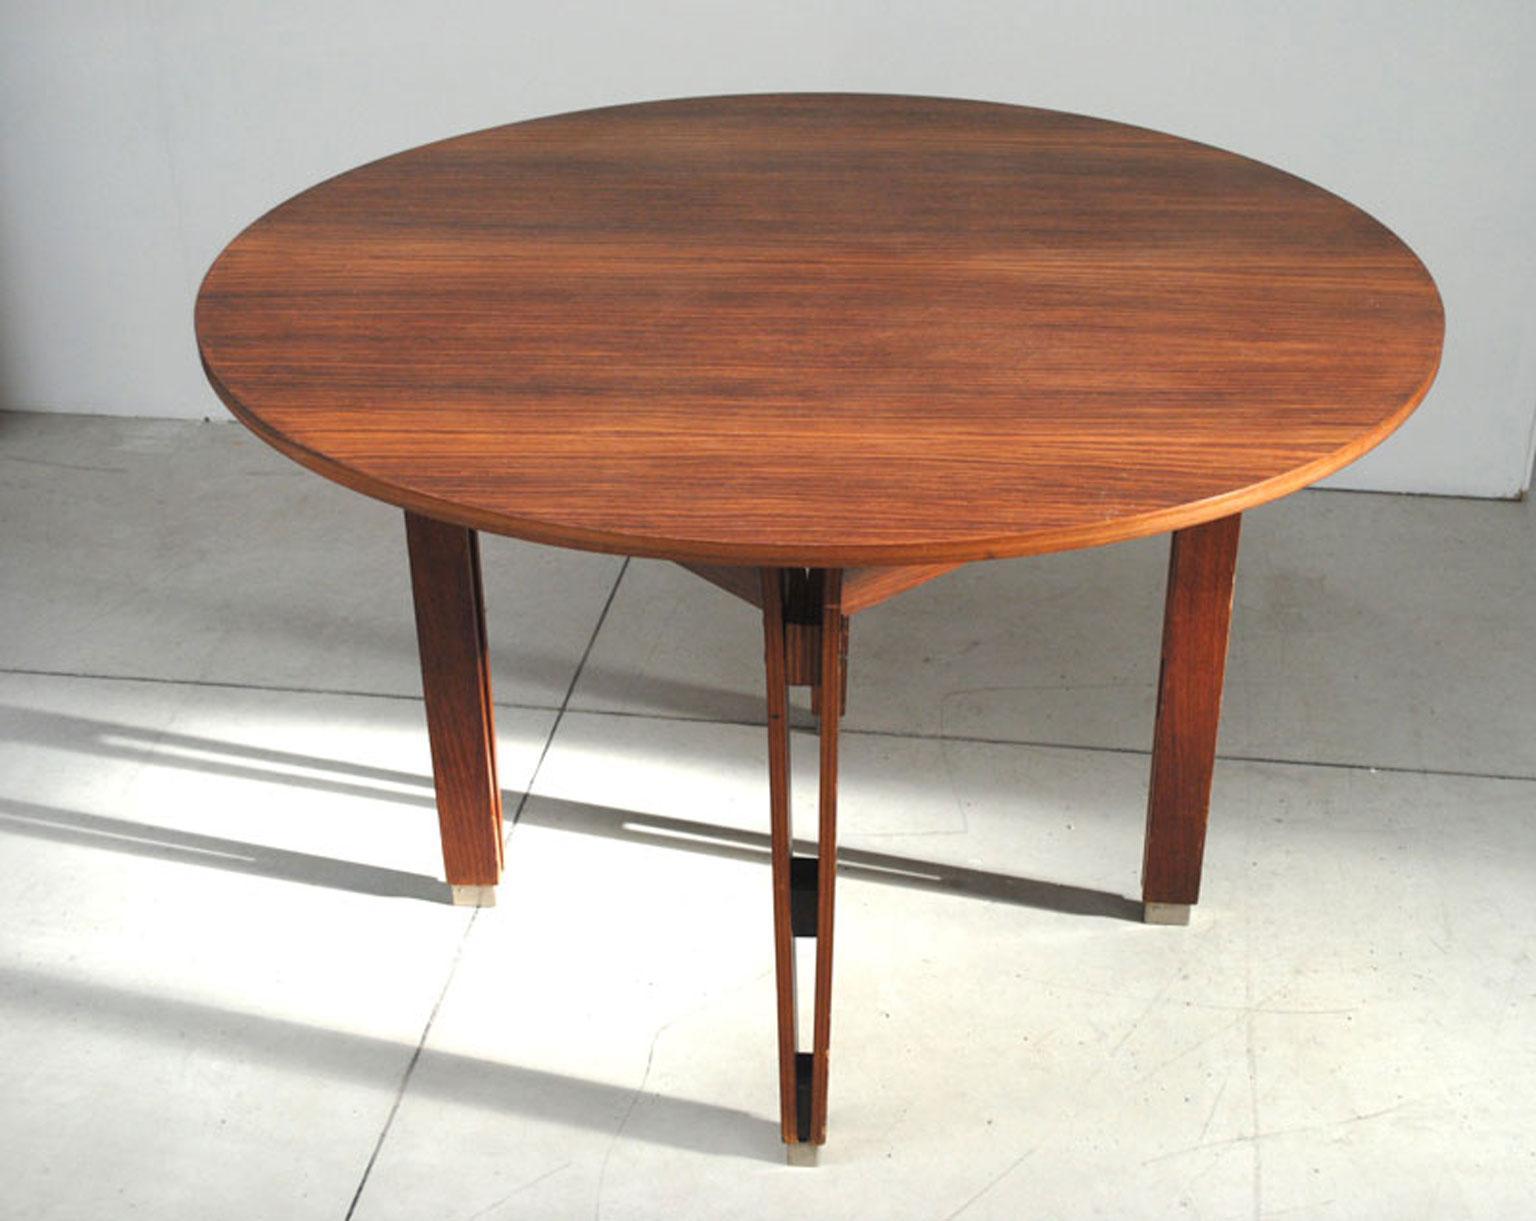 Ico U0026 Luisa Parisi Vintage Round Wooden Table